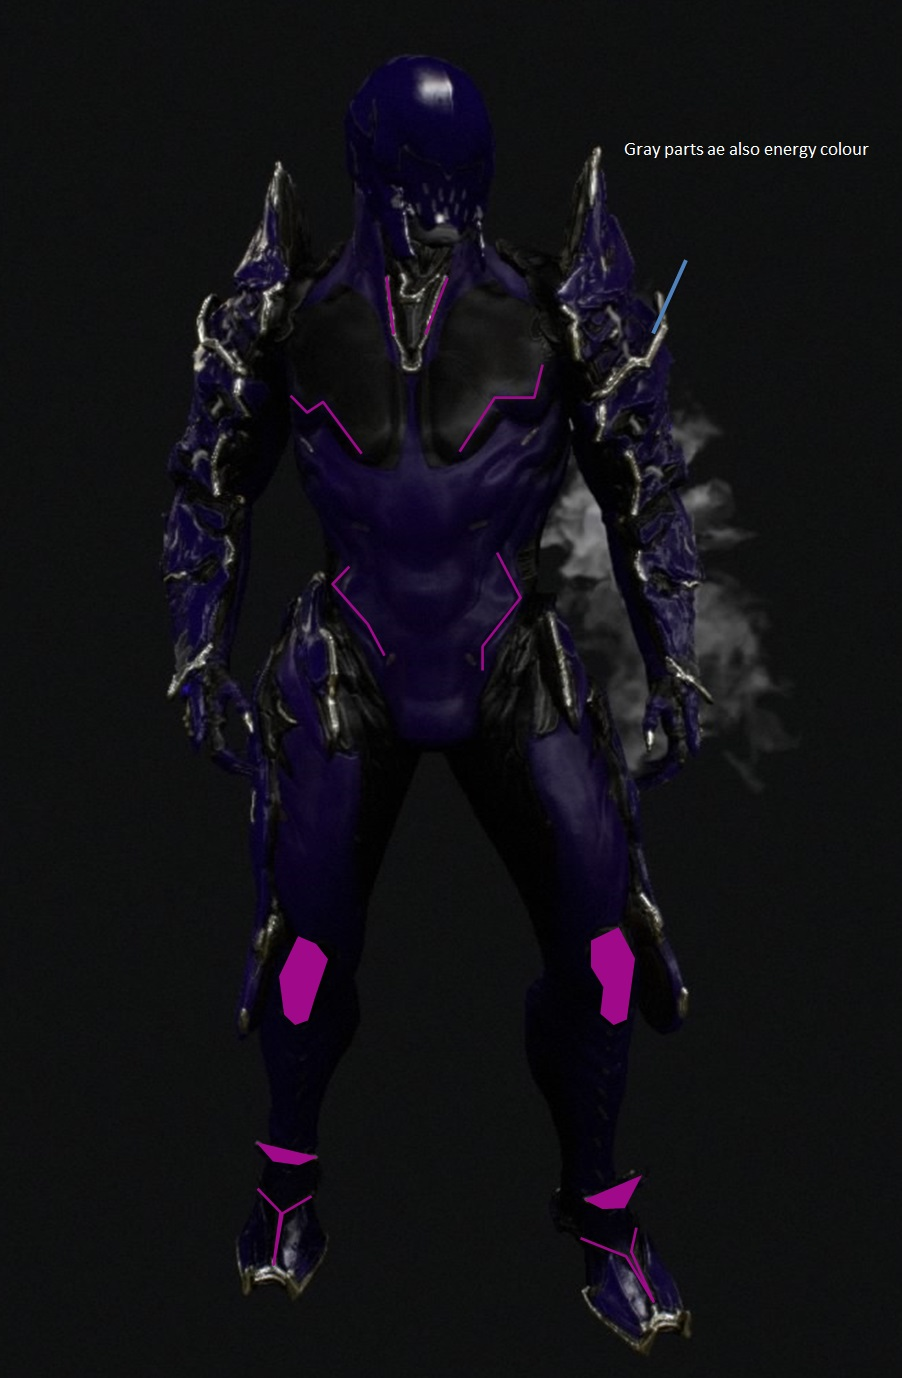 Ash energy colour 1 by Aaronj-c